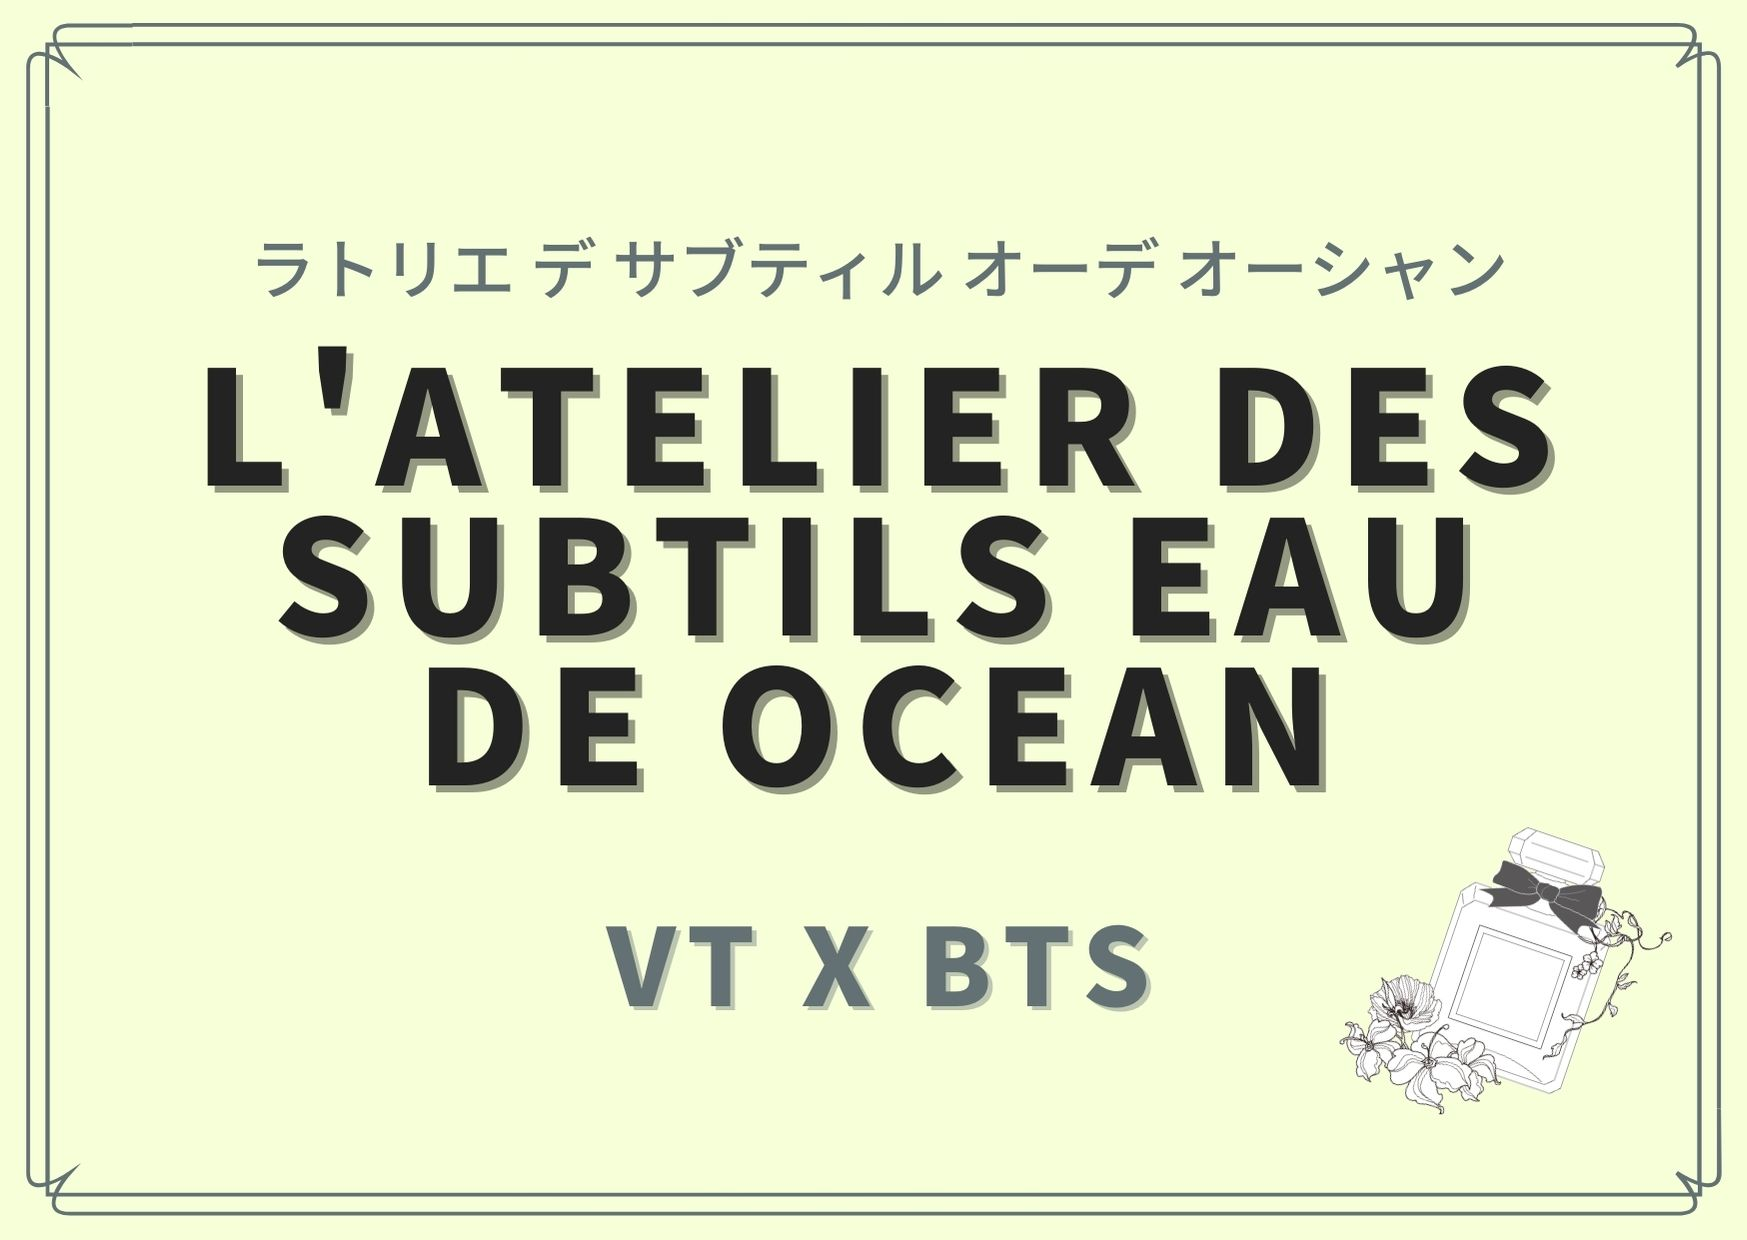 L'Atelier des Subtils Eau de Ocean(ラトリエ デ サブティル オーデ オーシャン)/VTxBTS(ブイティxビーティーエス)